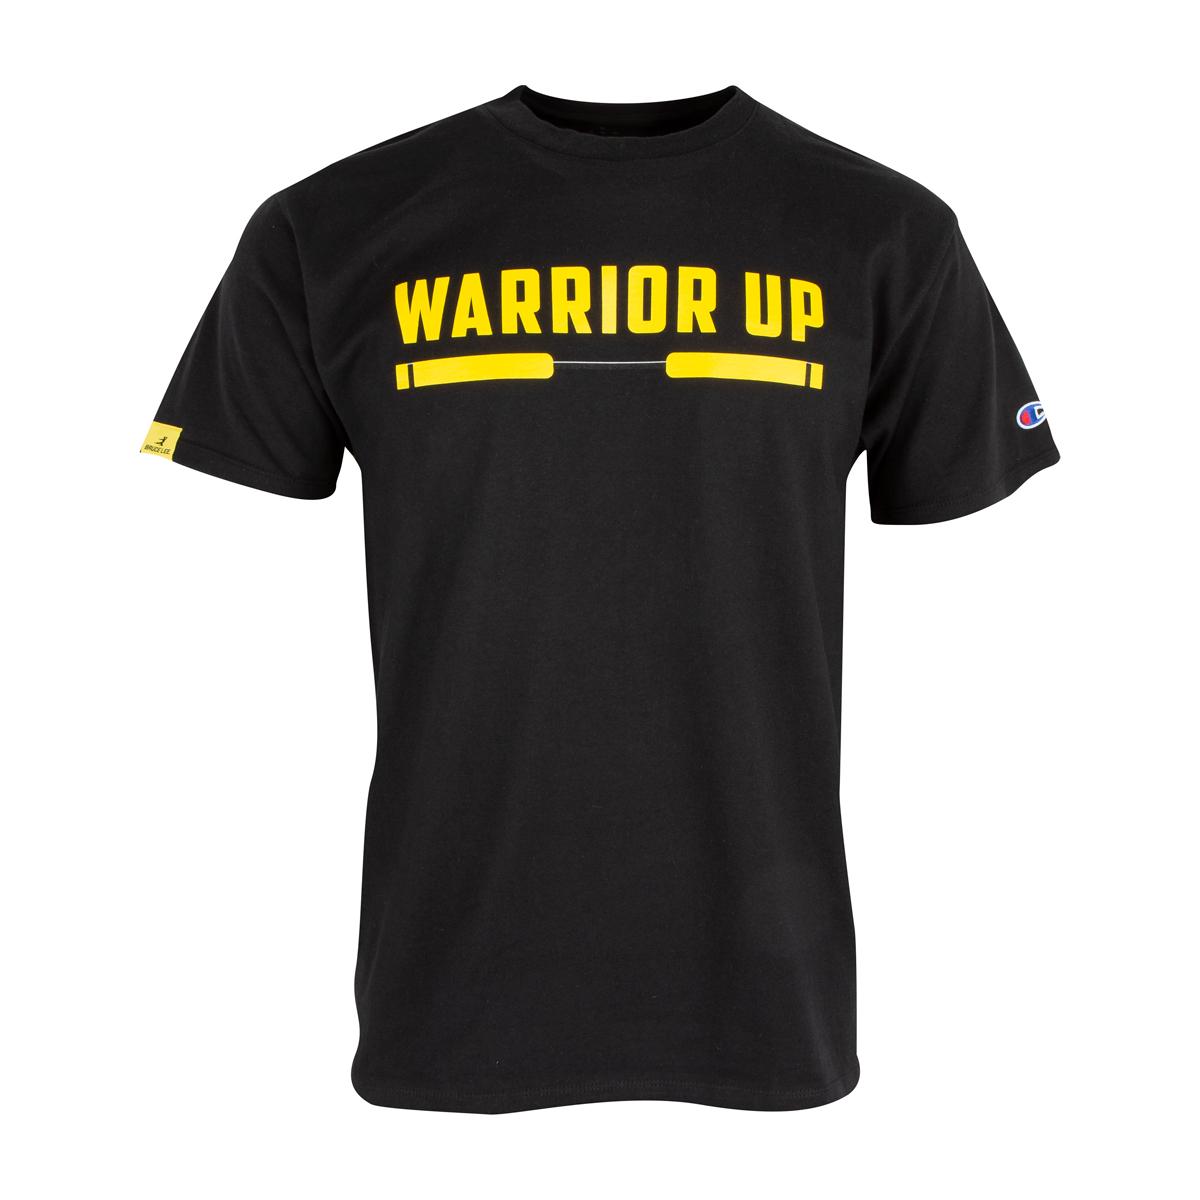 Warrior Up Champion T-shirt